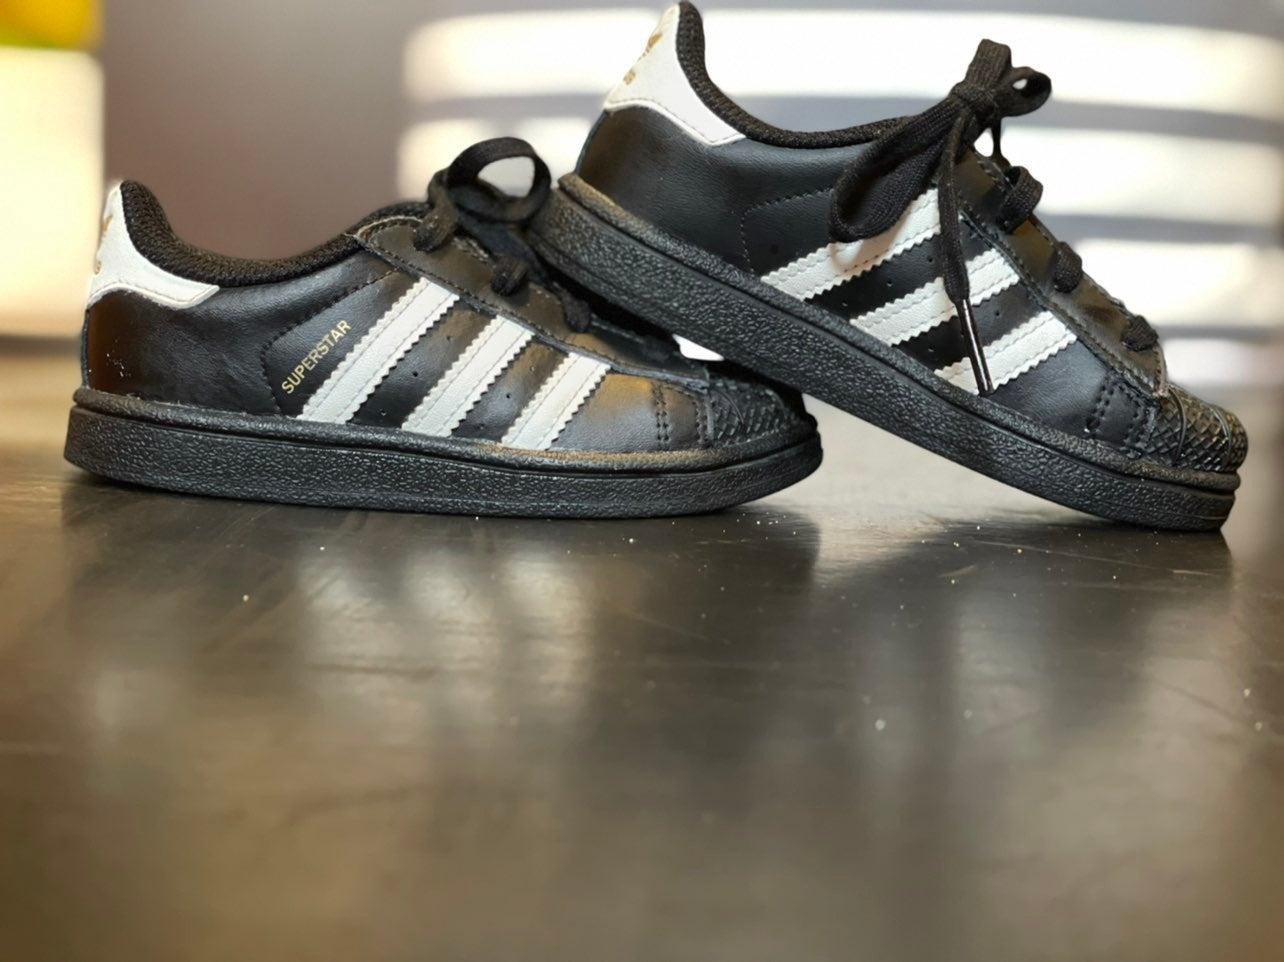 Adidas Superstar Black Shoes 8c toddler